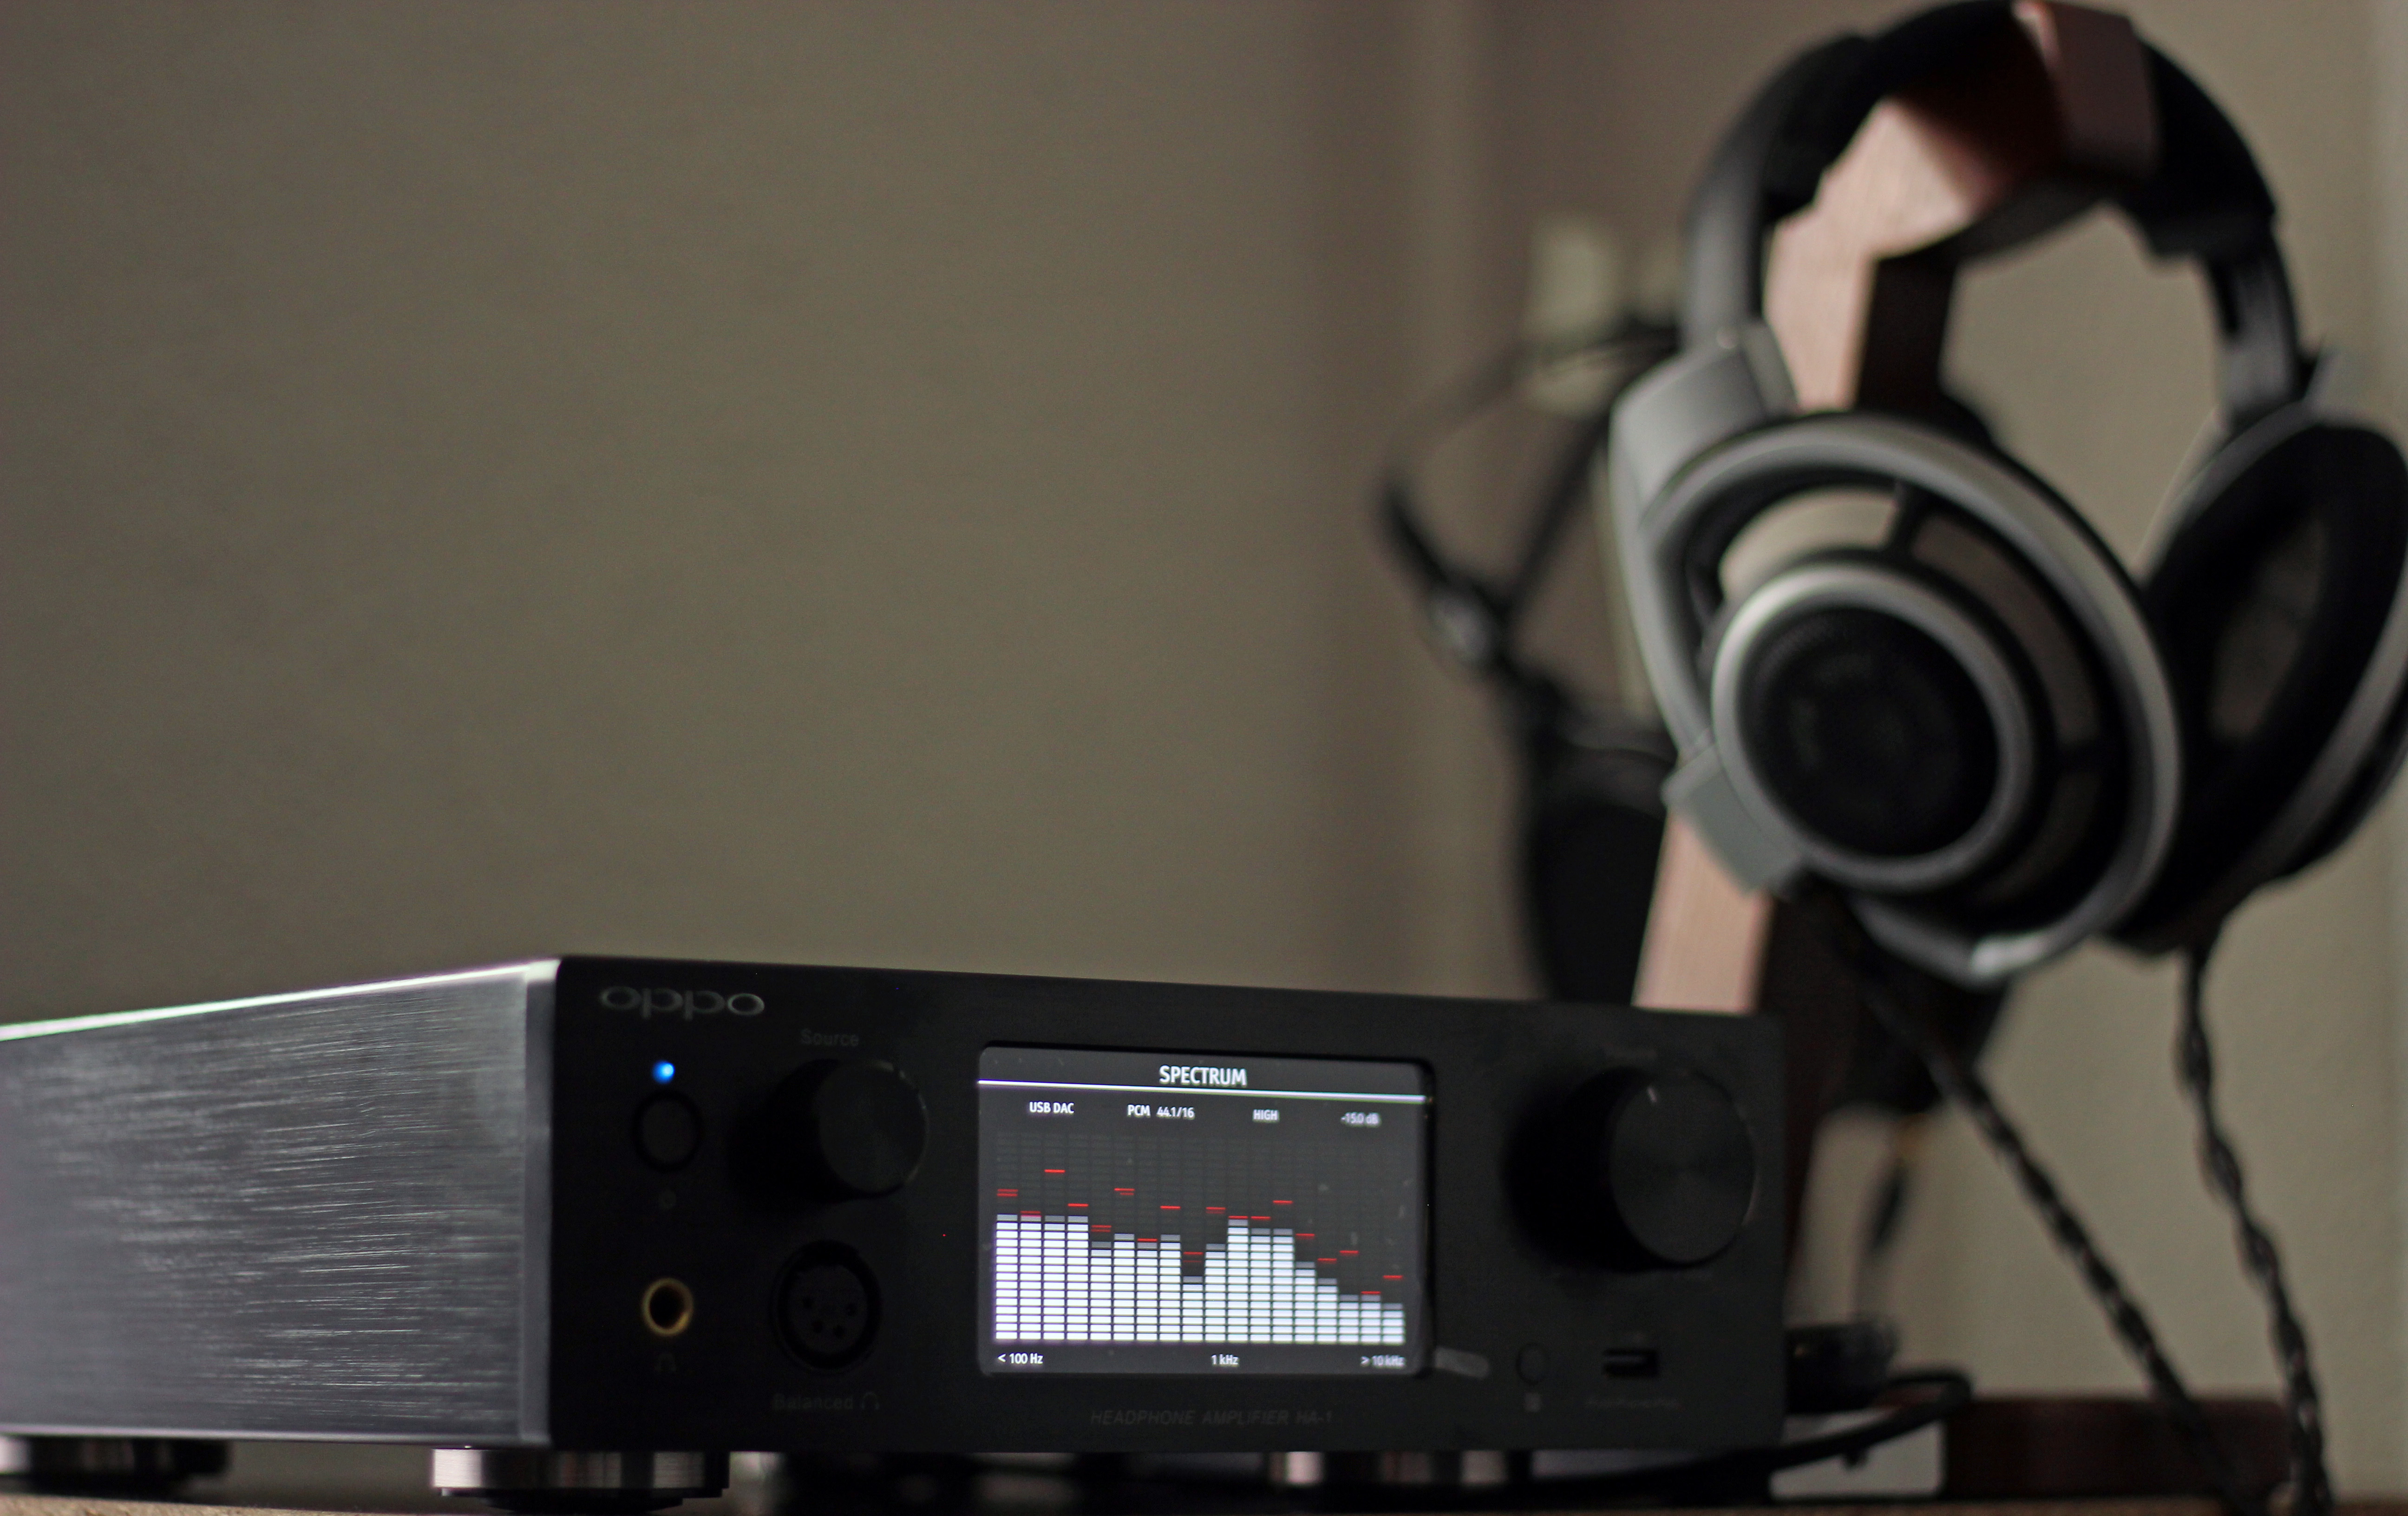 Oppo Ha 1 Dac Headphone Amplifier Review Headmania Sennheiser Hd 800 Dynamic Stereo Listening Impressions